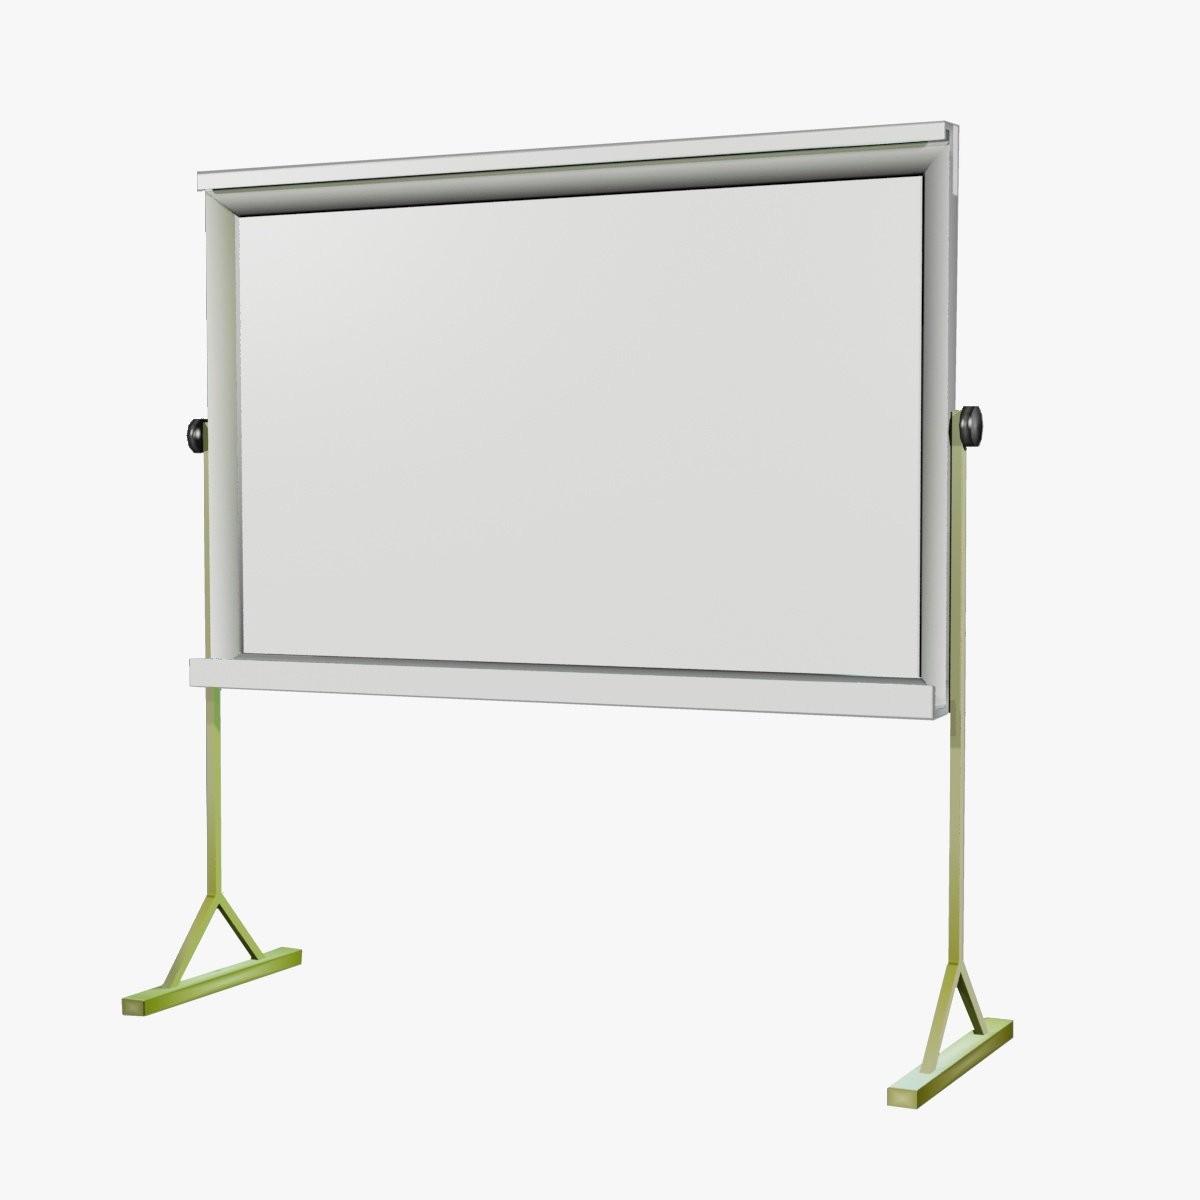 Whiteboard01.jpg